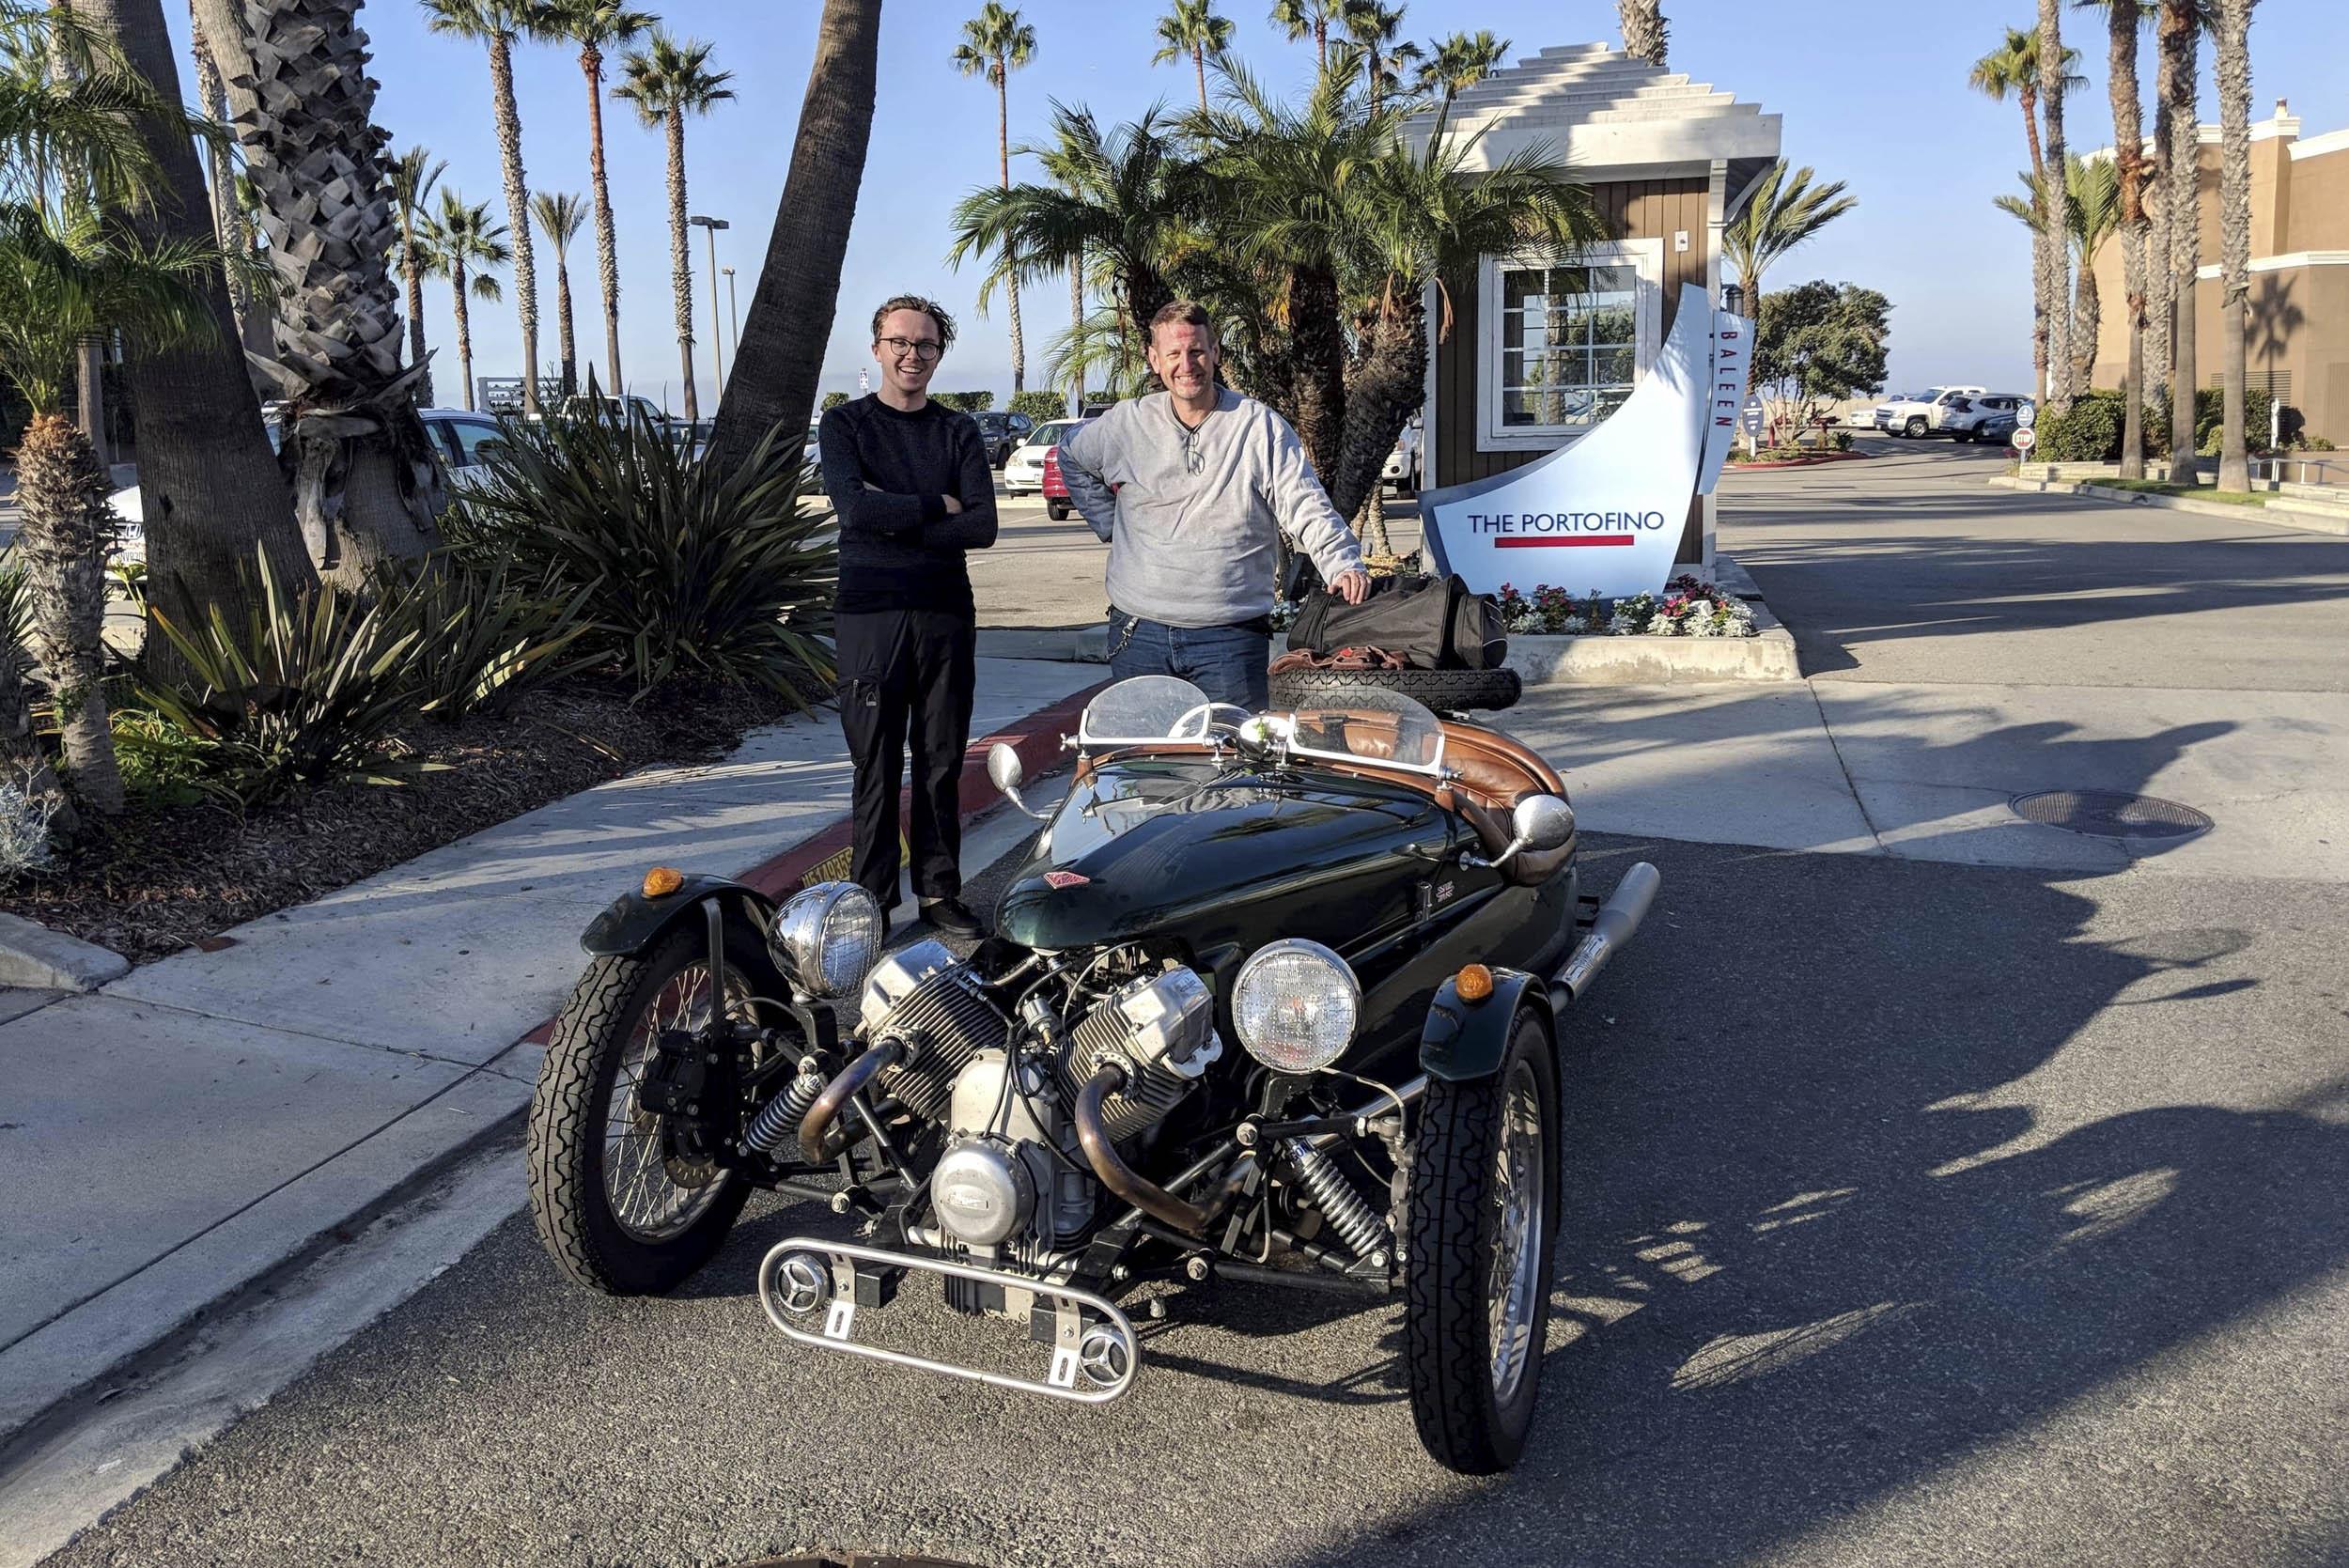 Brian Daughdrill and Lochie Ferrier arrive in Redondo Beach, California